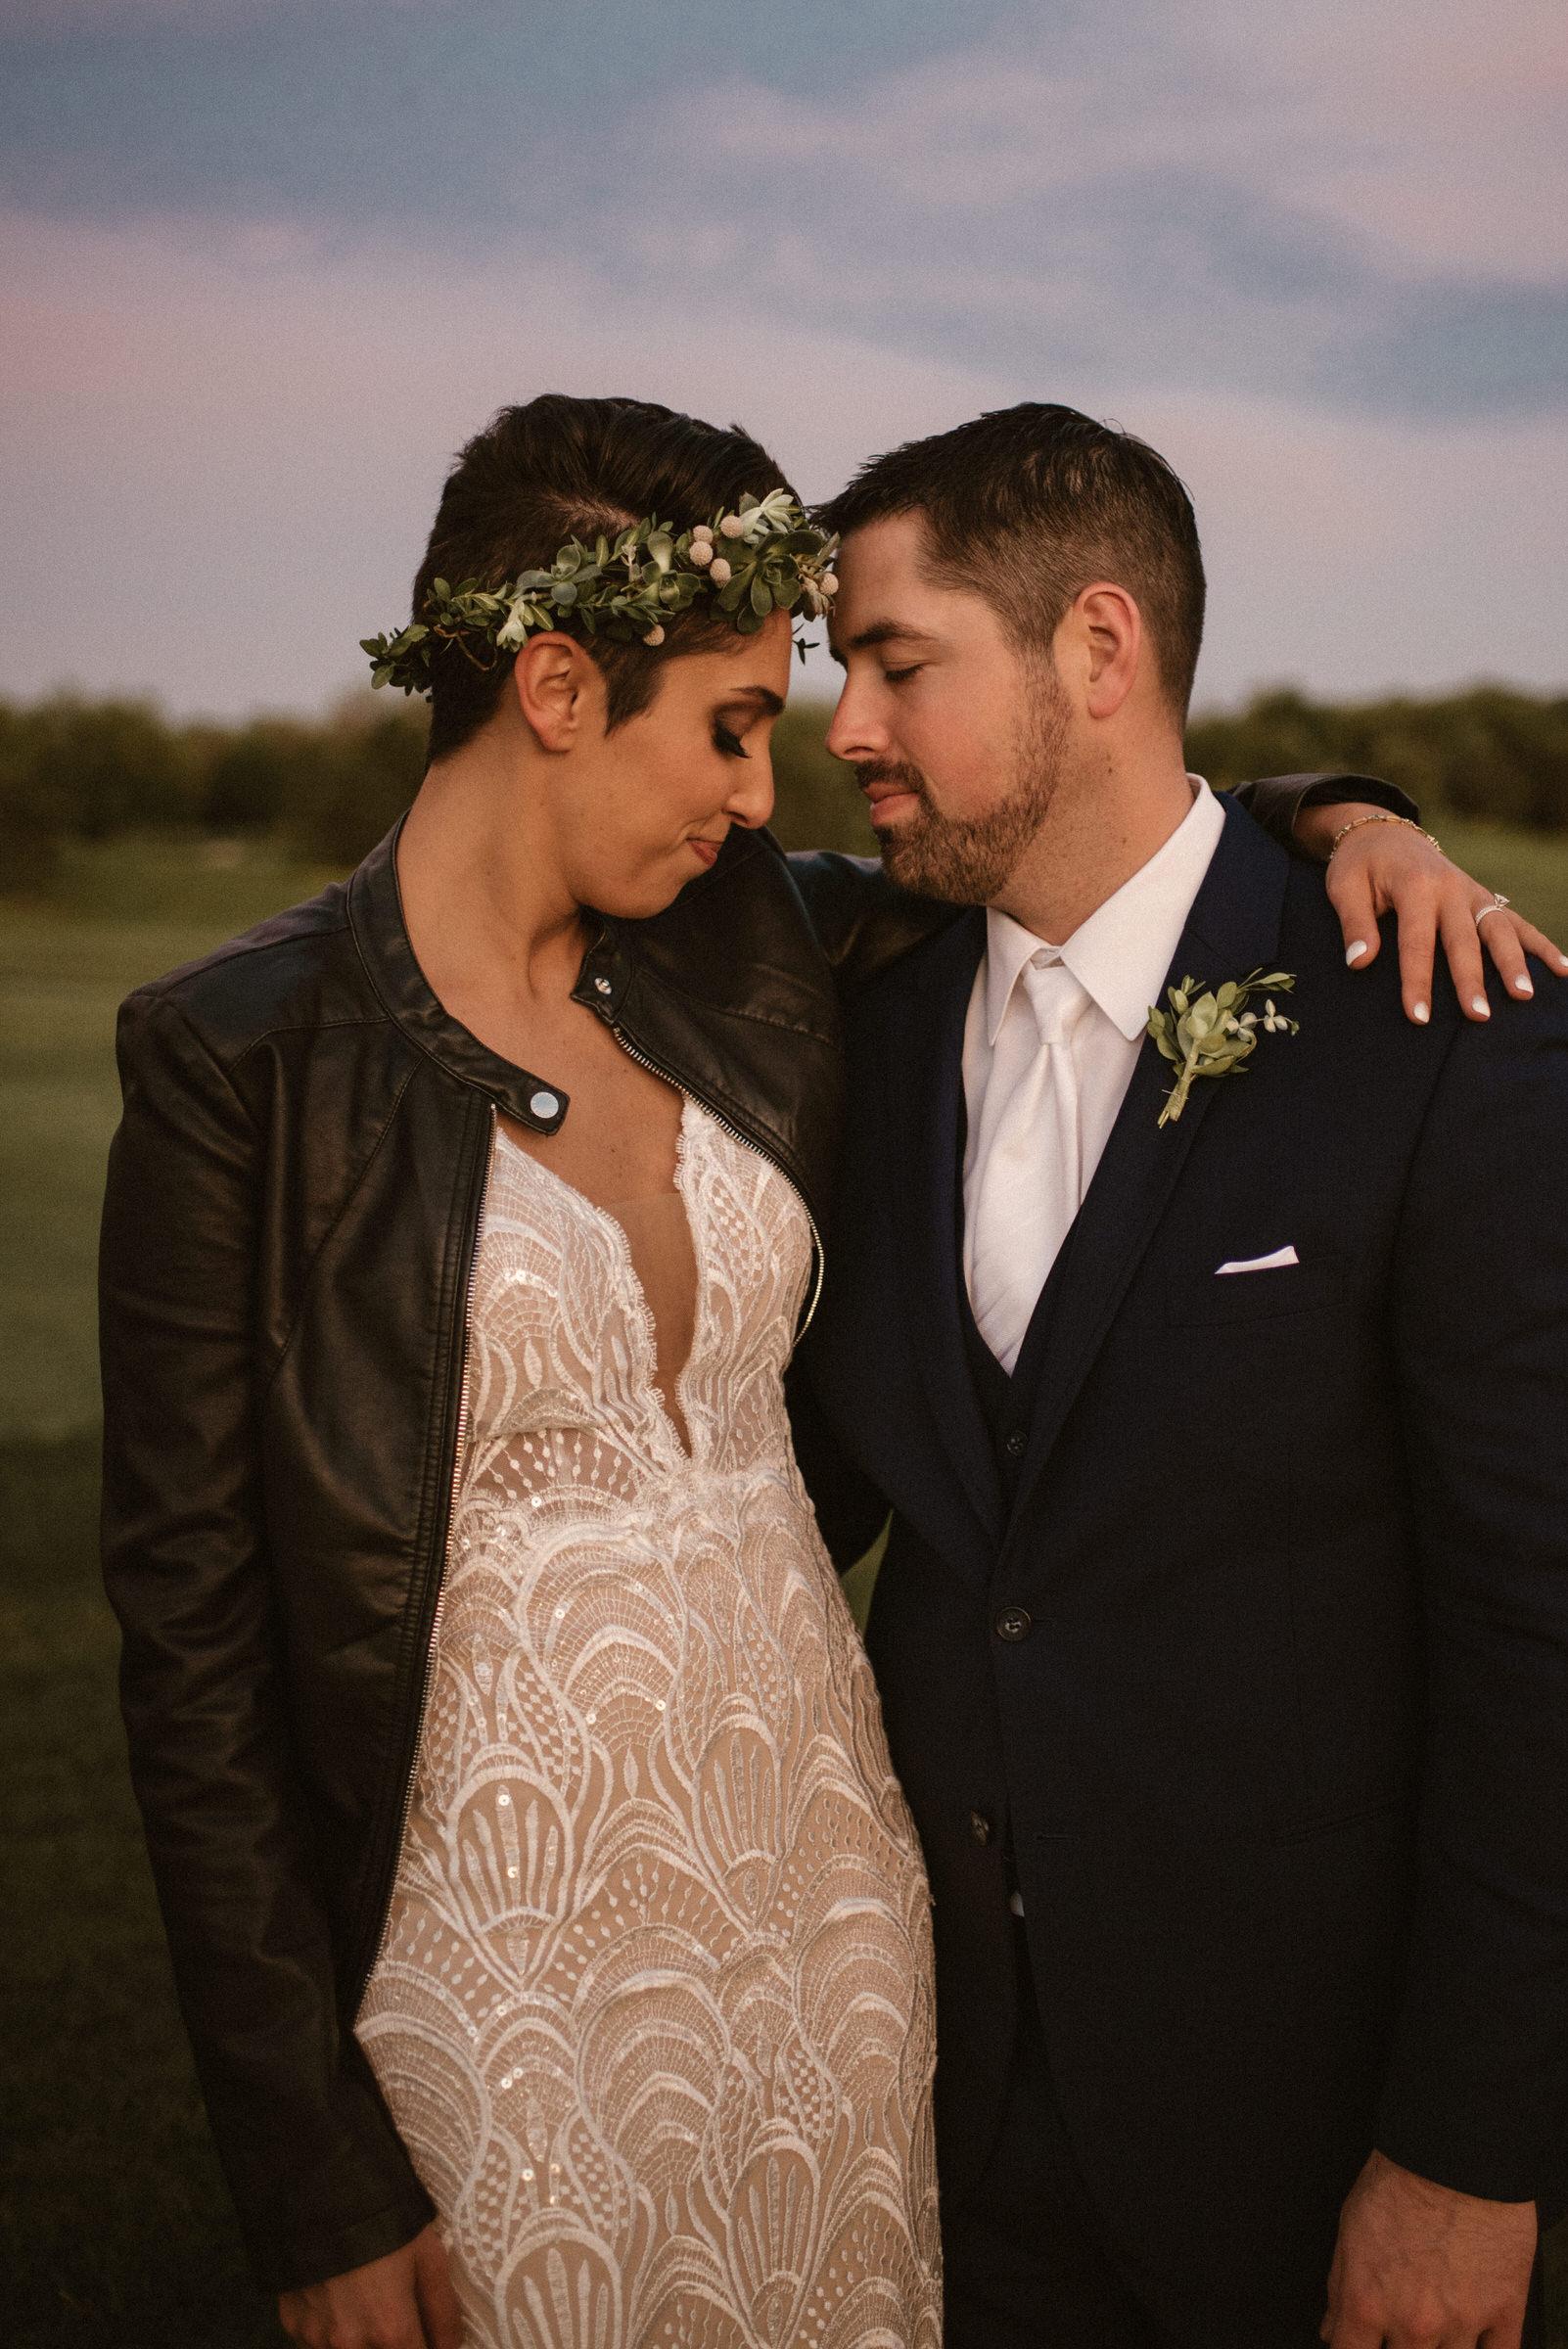 Wilderness-Ridge-Lincoln-Nebraska-Wedding-Kaylie-Sirek-Photography-128.jpg